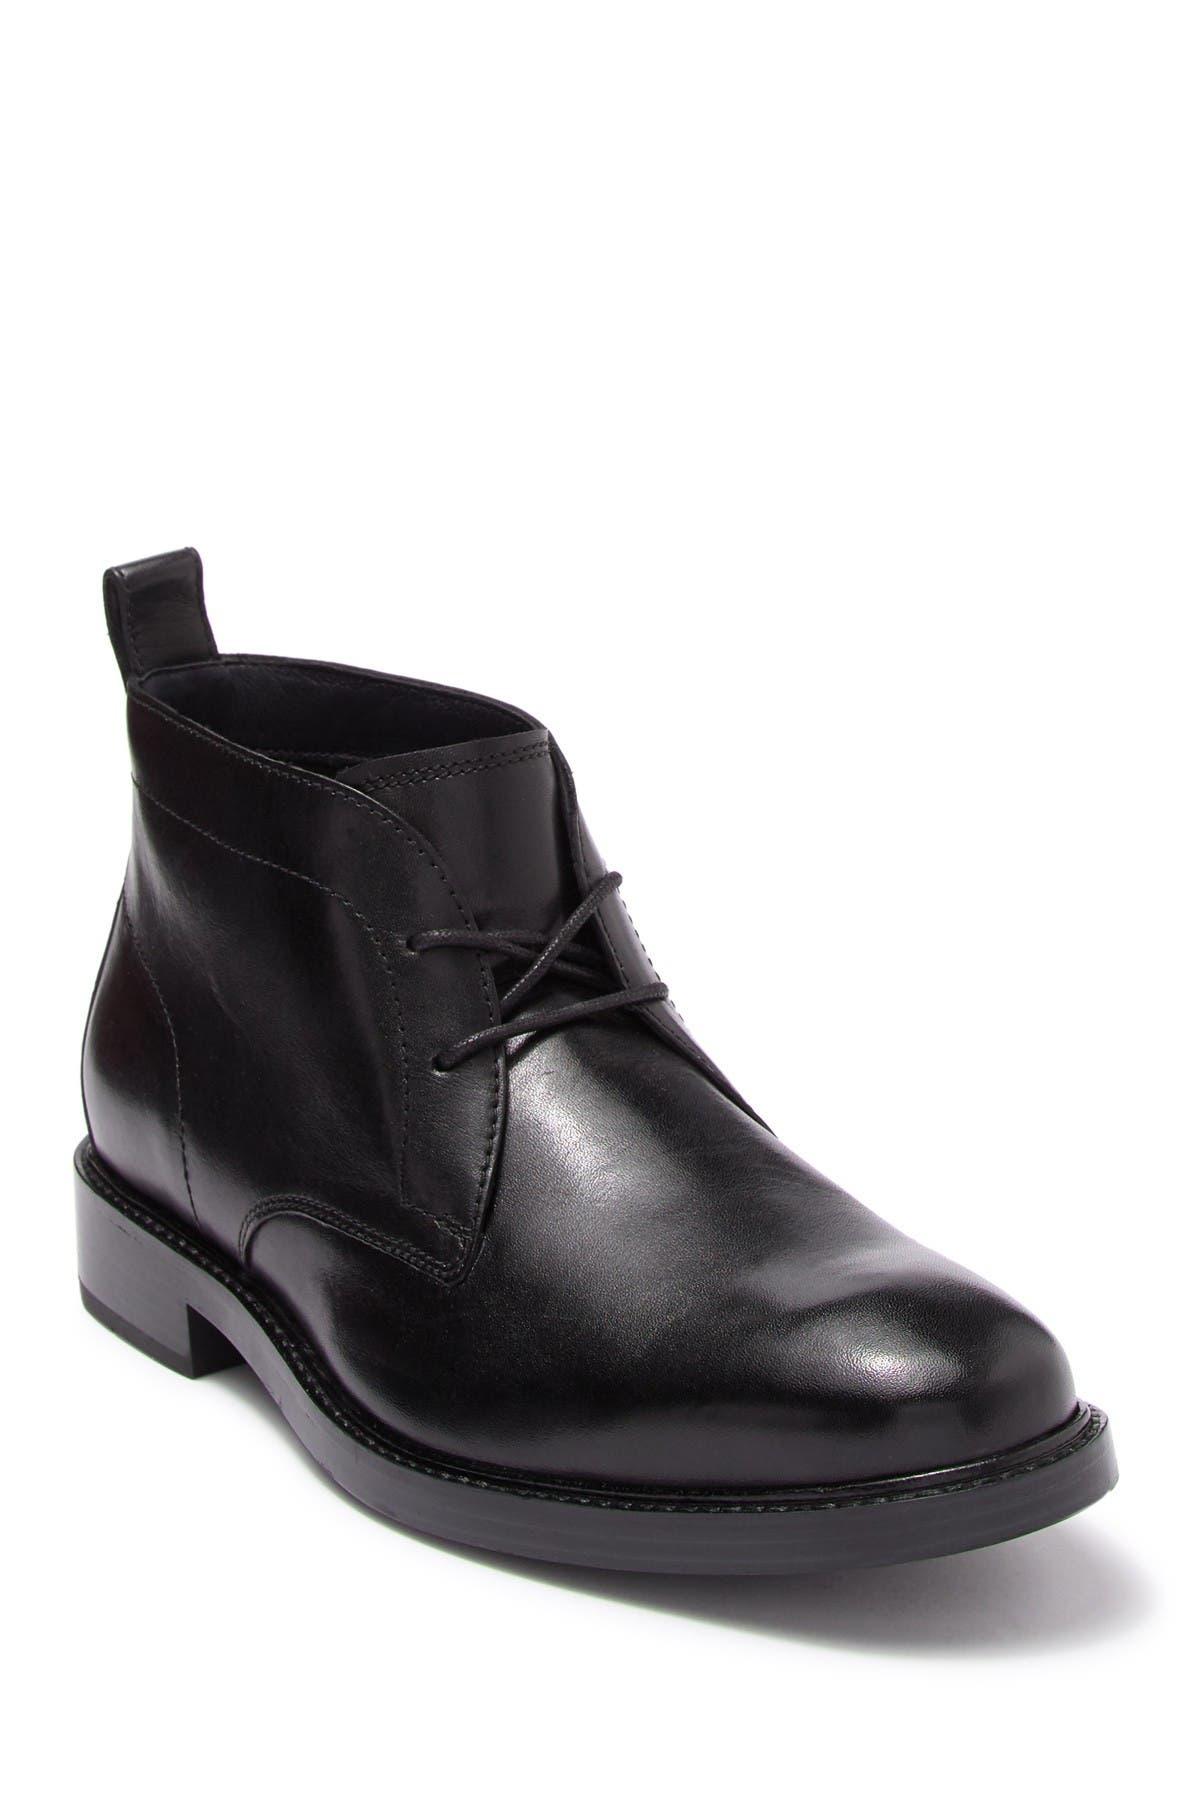 Kennedy Grand Waterproof Leather Chukka